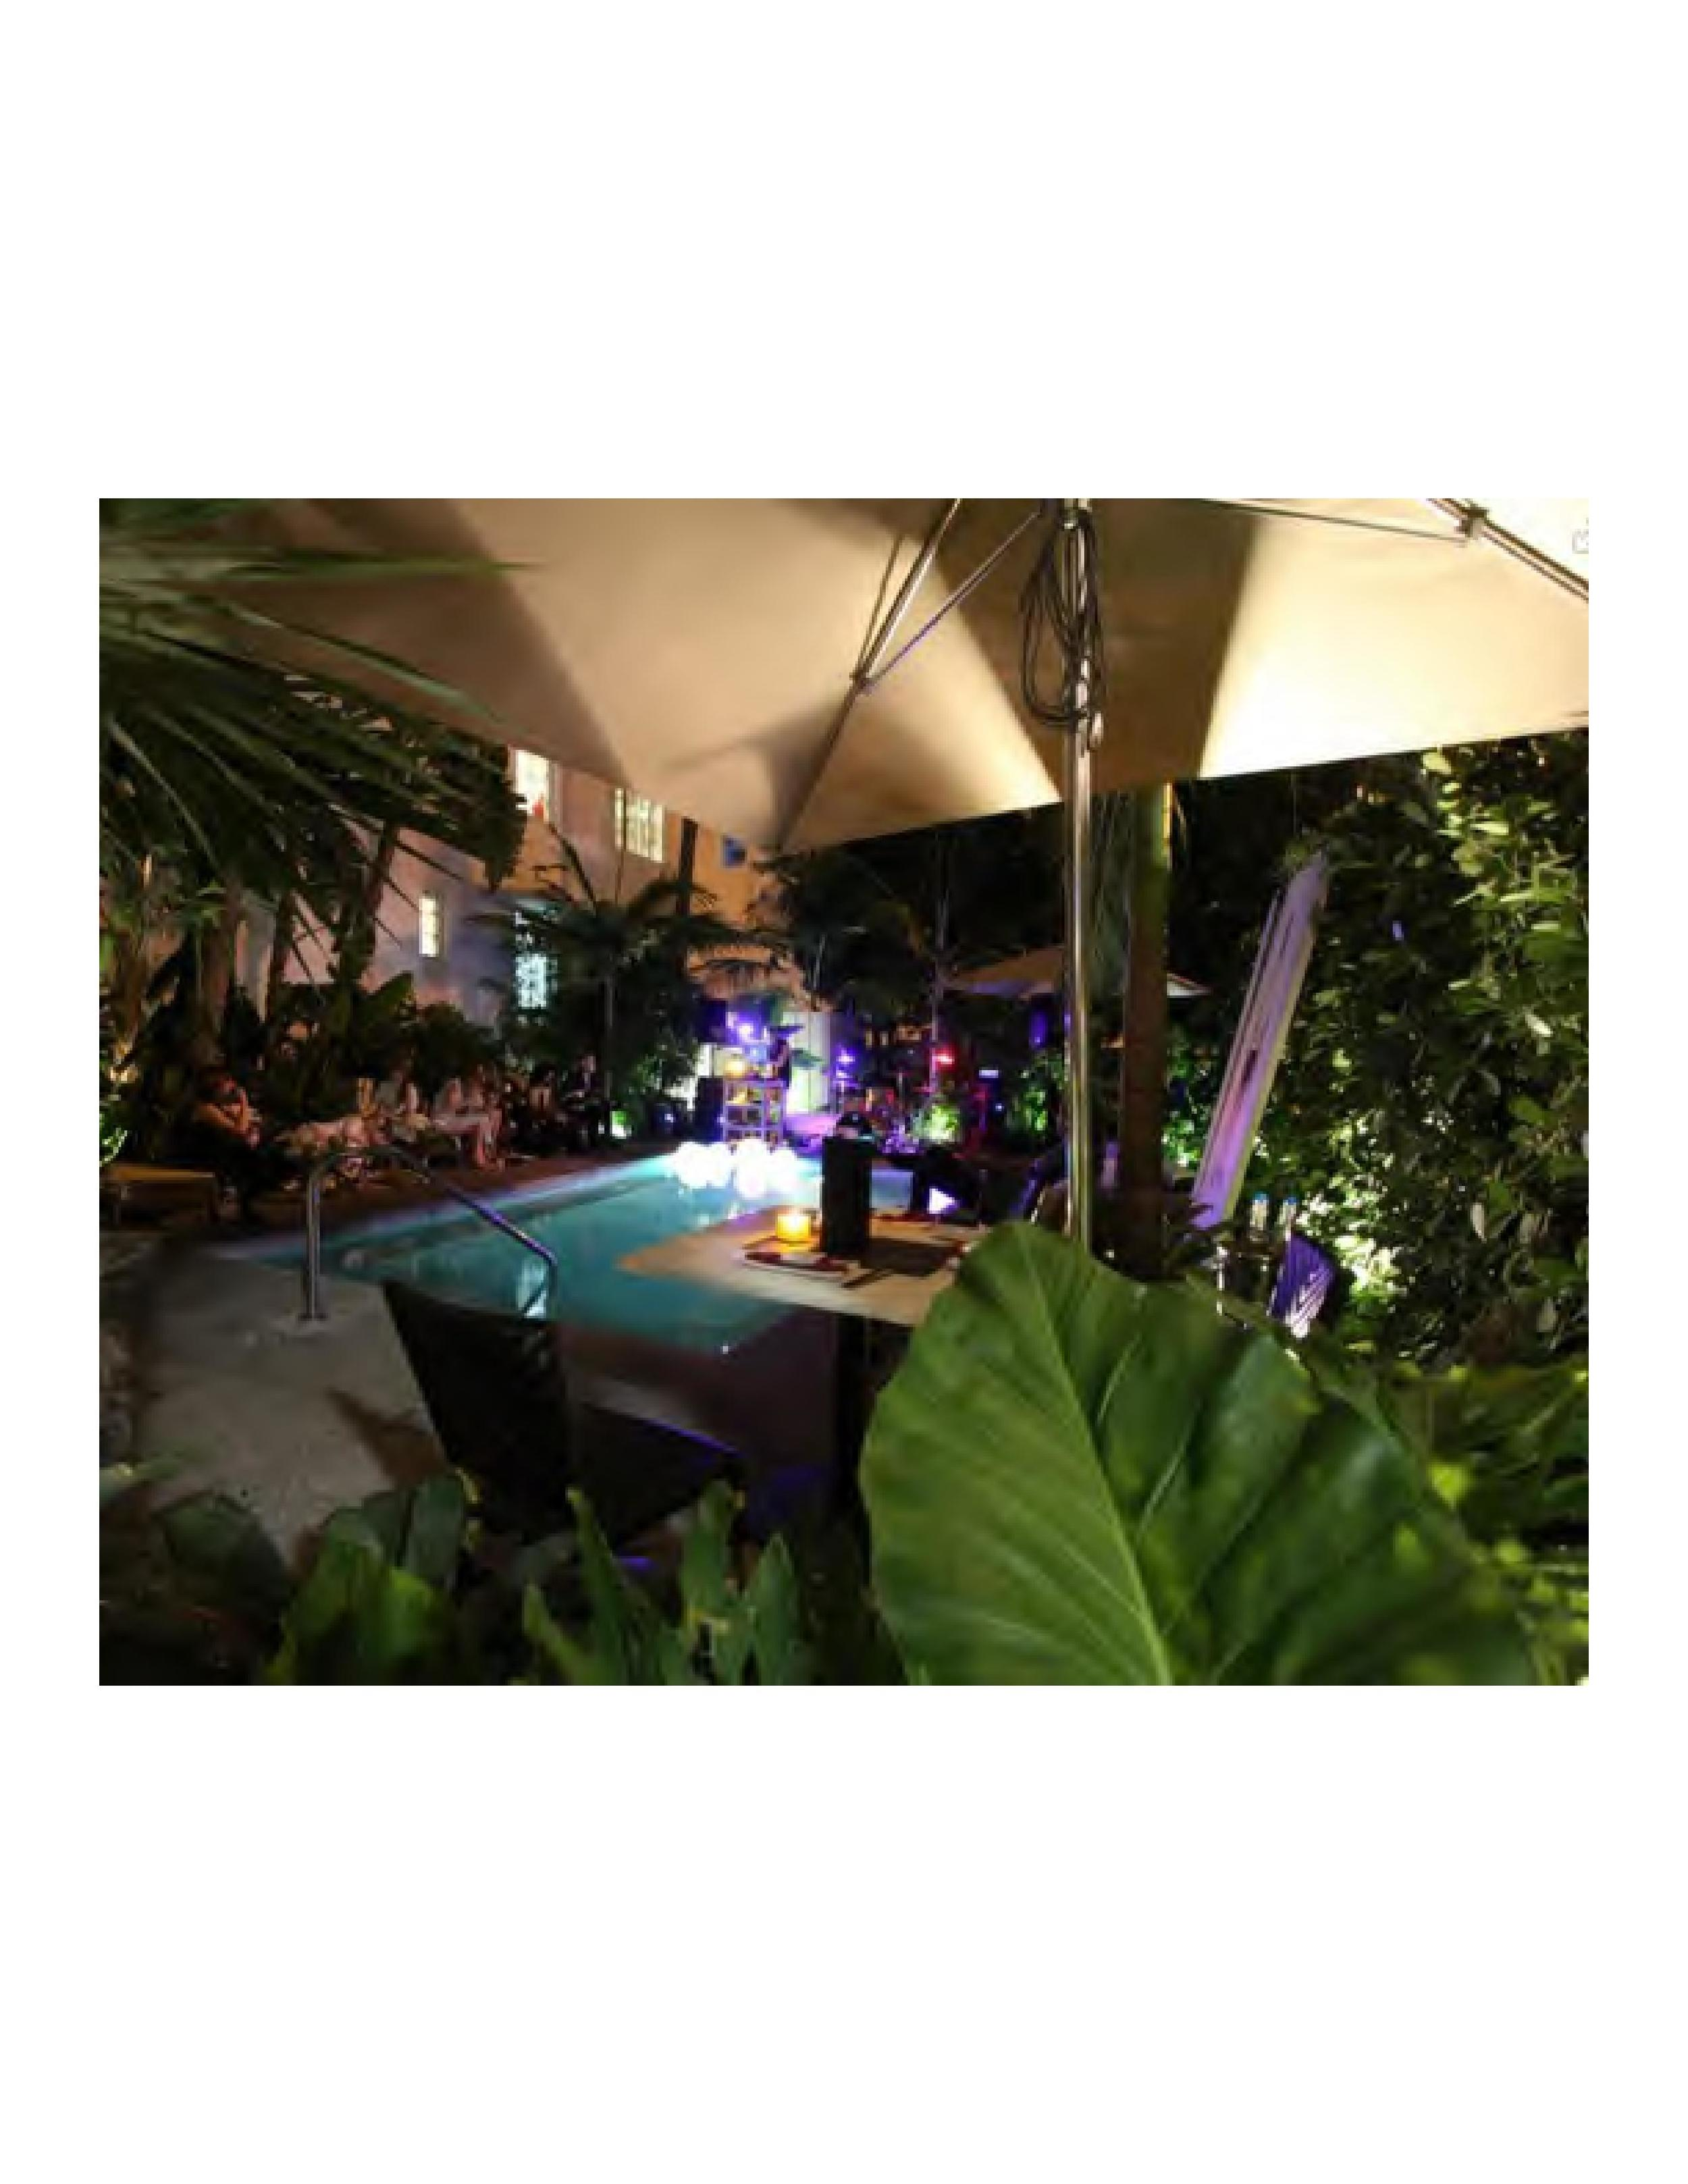 Miami_Art_Basel_Photographs-web-page-086.jpg